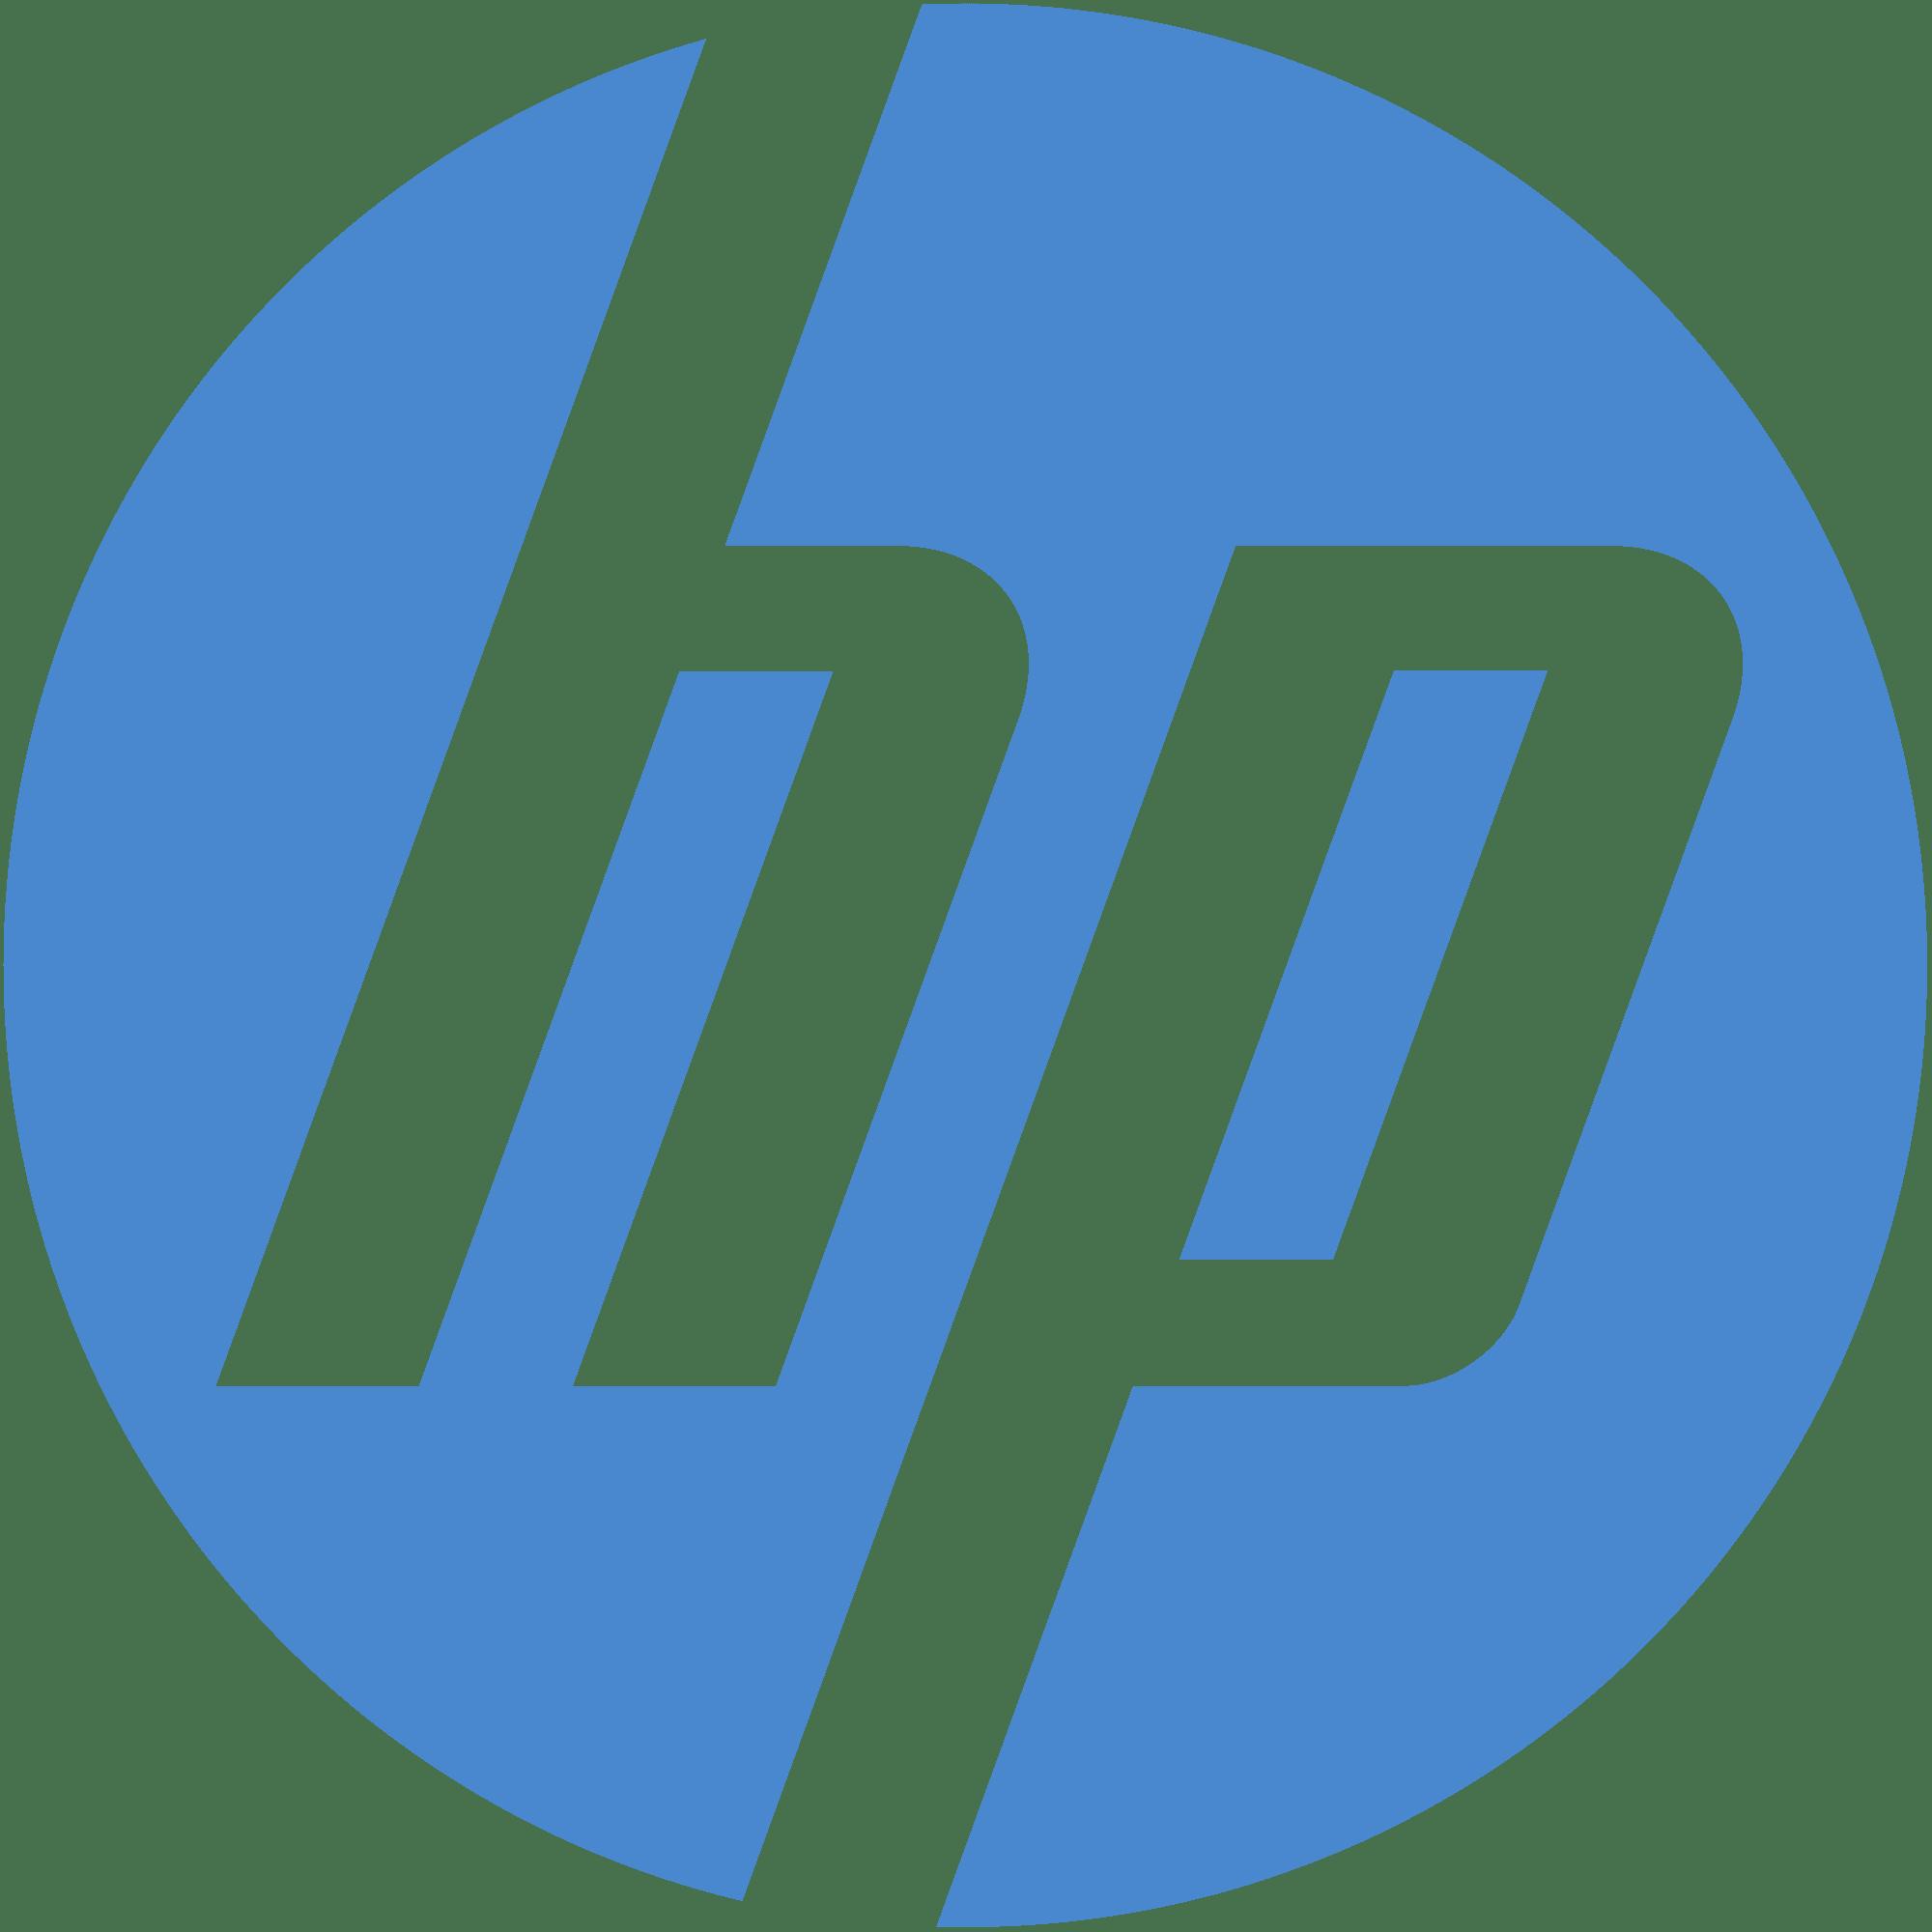 HP Scanjet G2710 Photo Scanner drivers